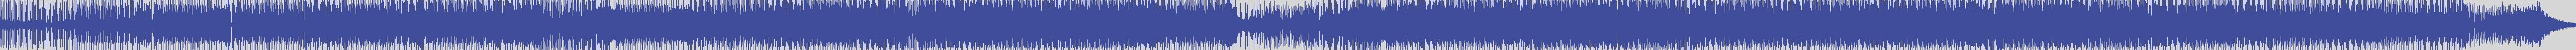 just_digital_records [JS1191] Marco Furnari - Waiting for the Sun [Original Mix] audio wave form